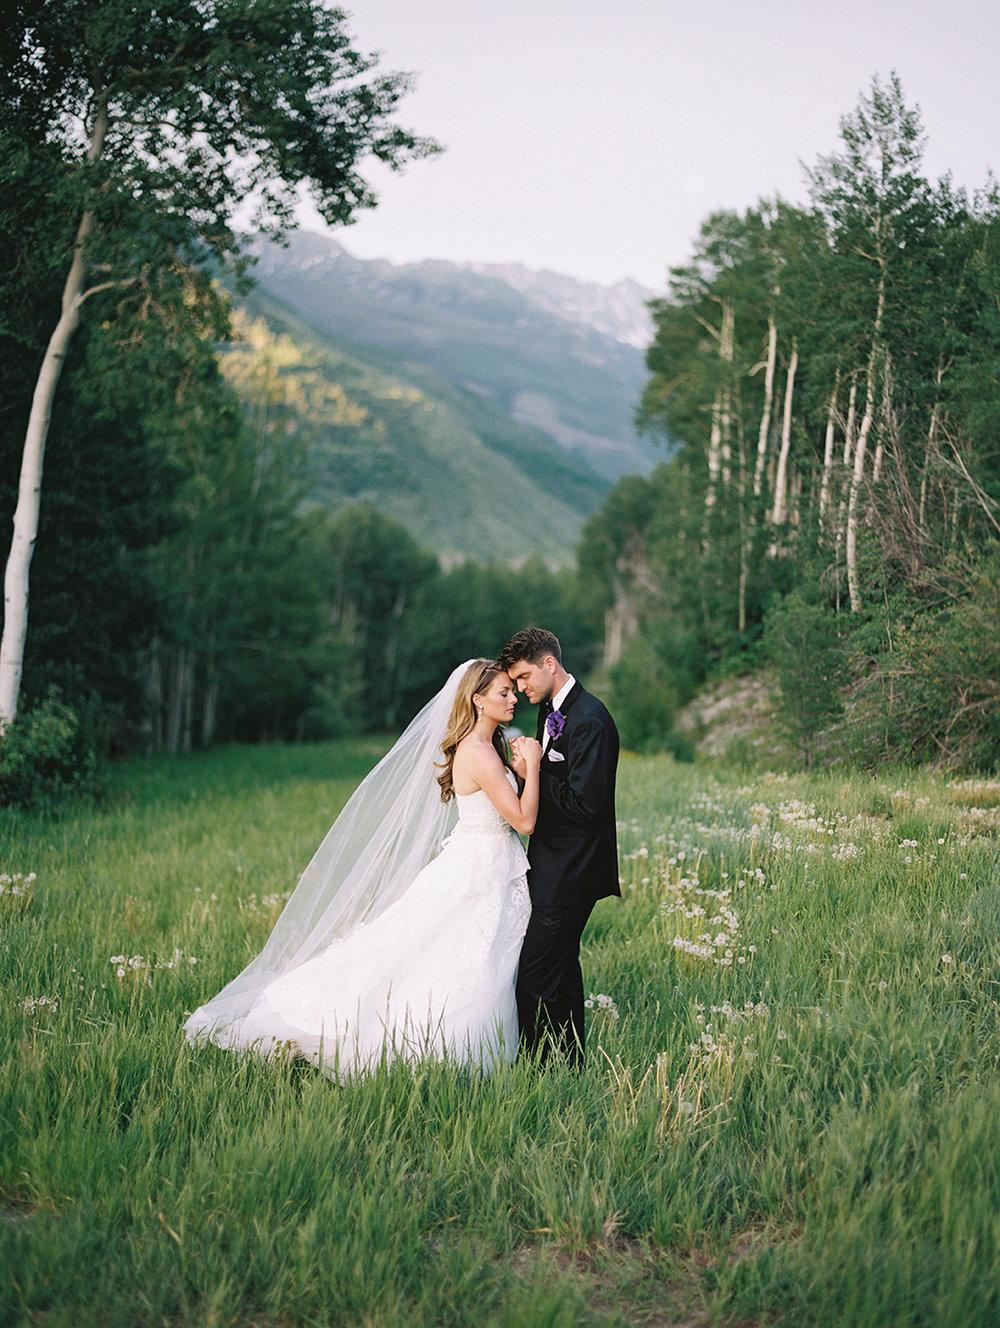 324_Graham+Shannon_Fine_Art_Film_Photography_Wedding_Colorado_.jpg